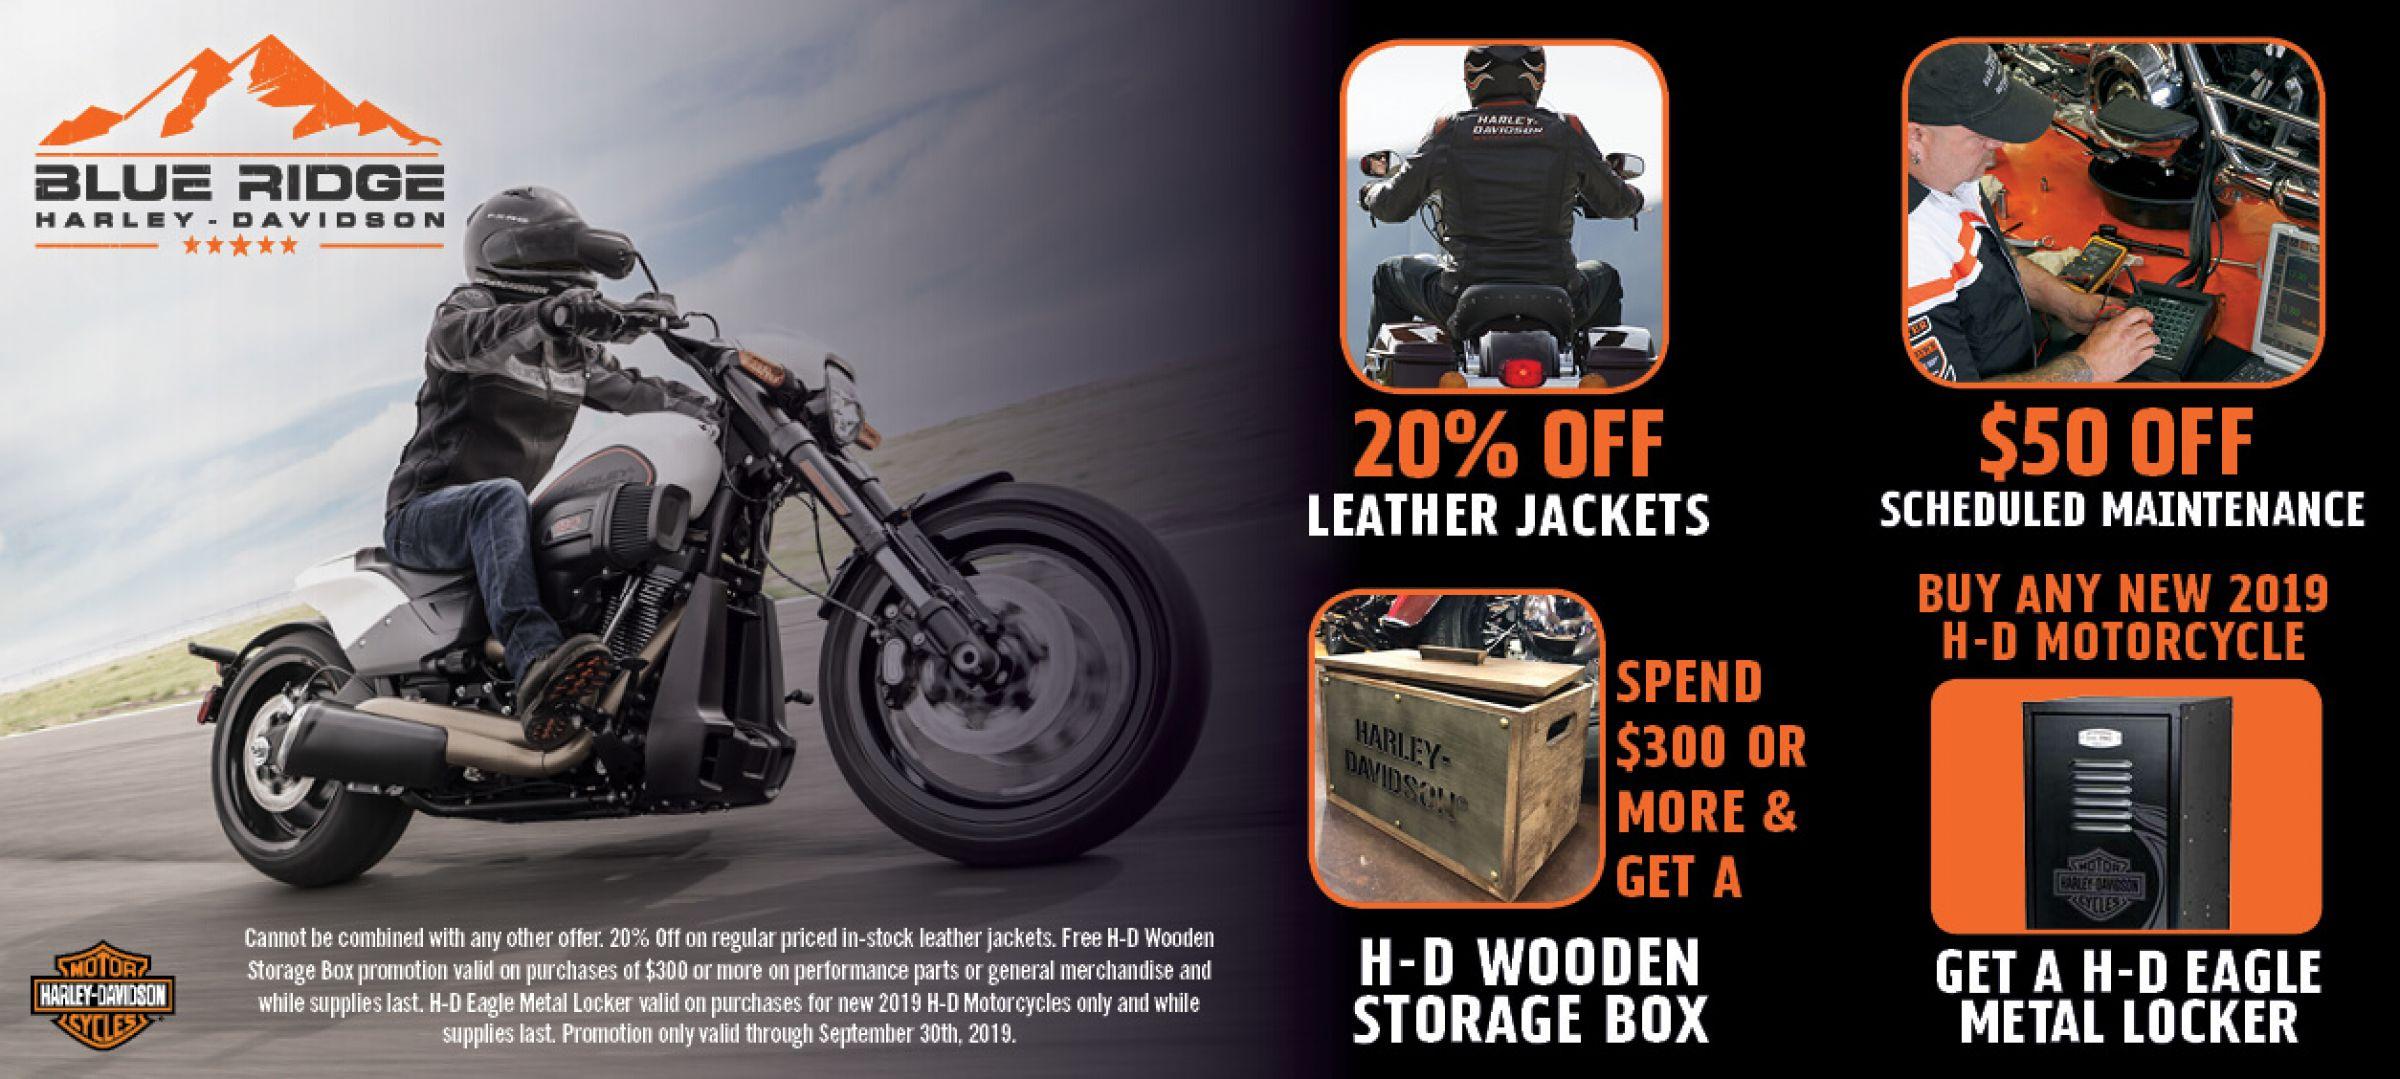 New & Used Motorcycle Dealer | Blue Ridge Harley-Davidson®